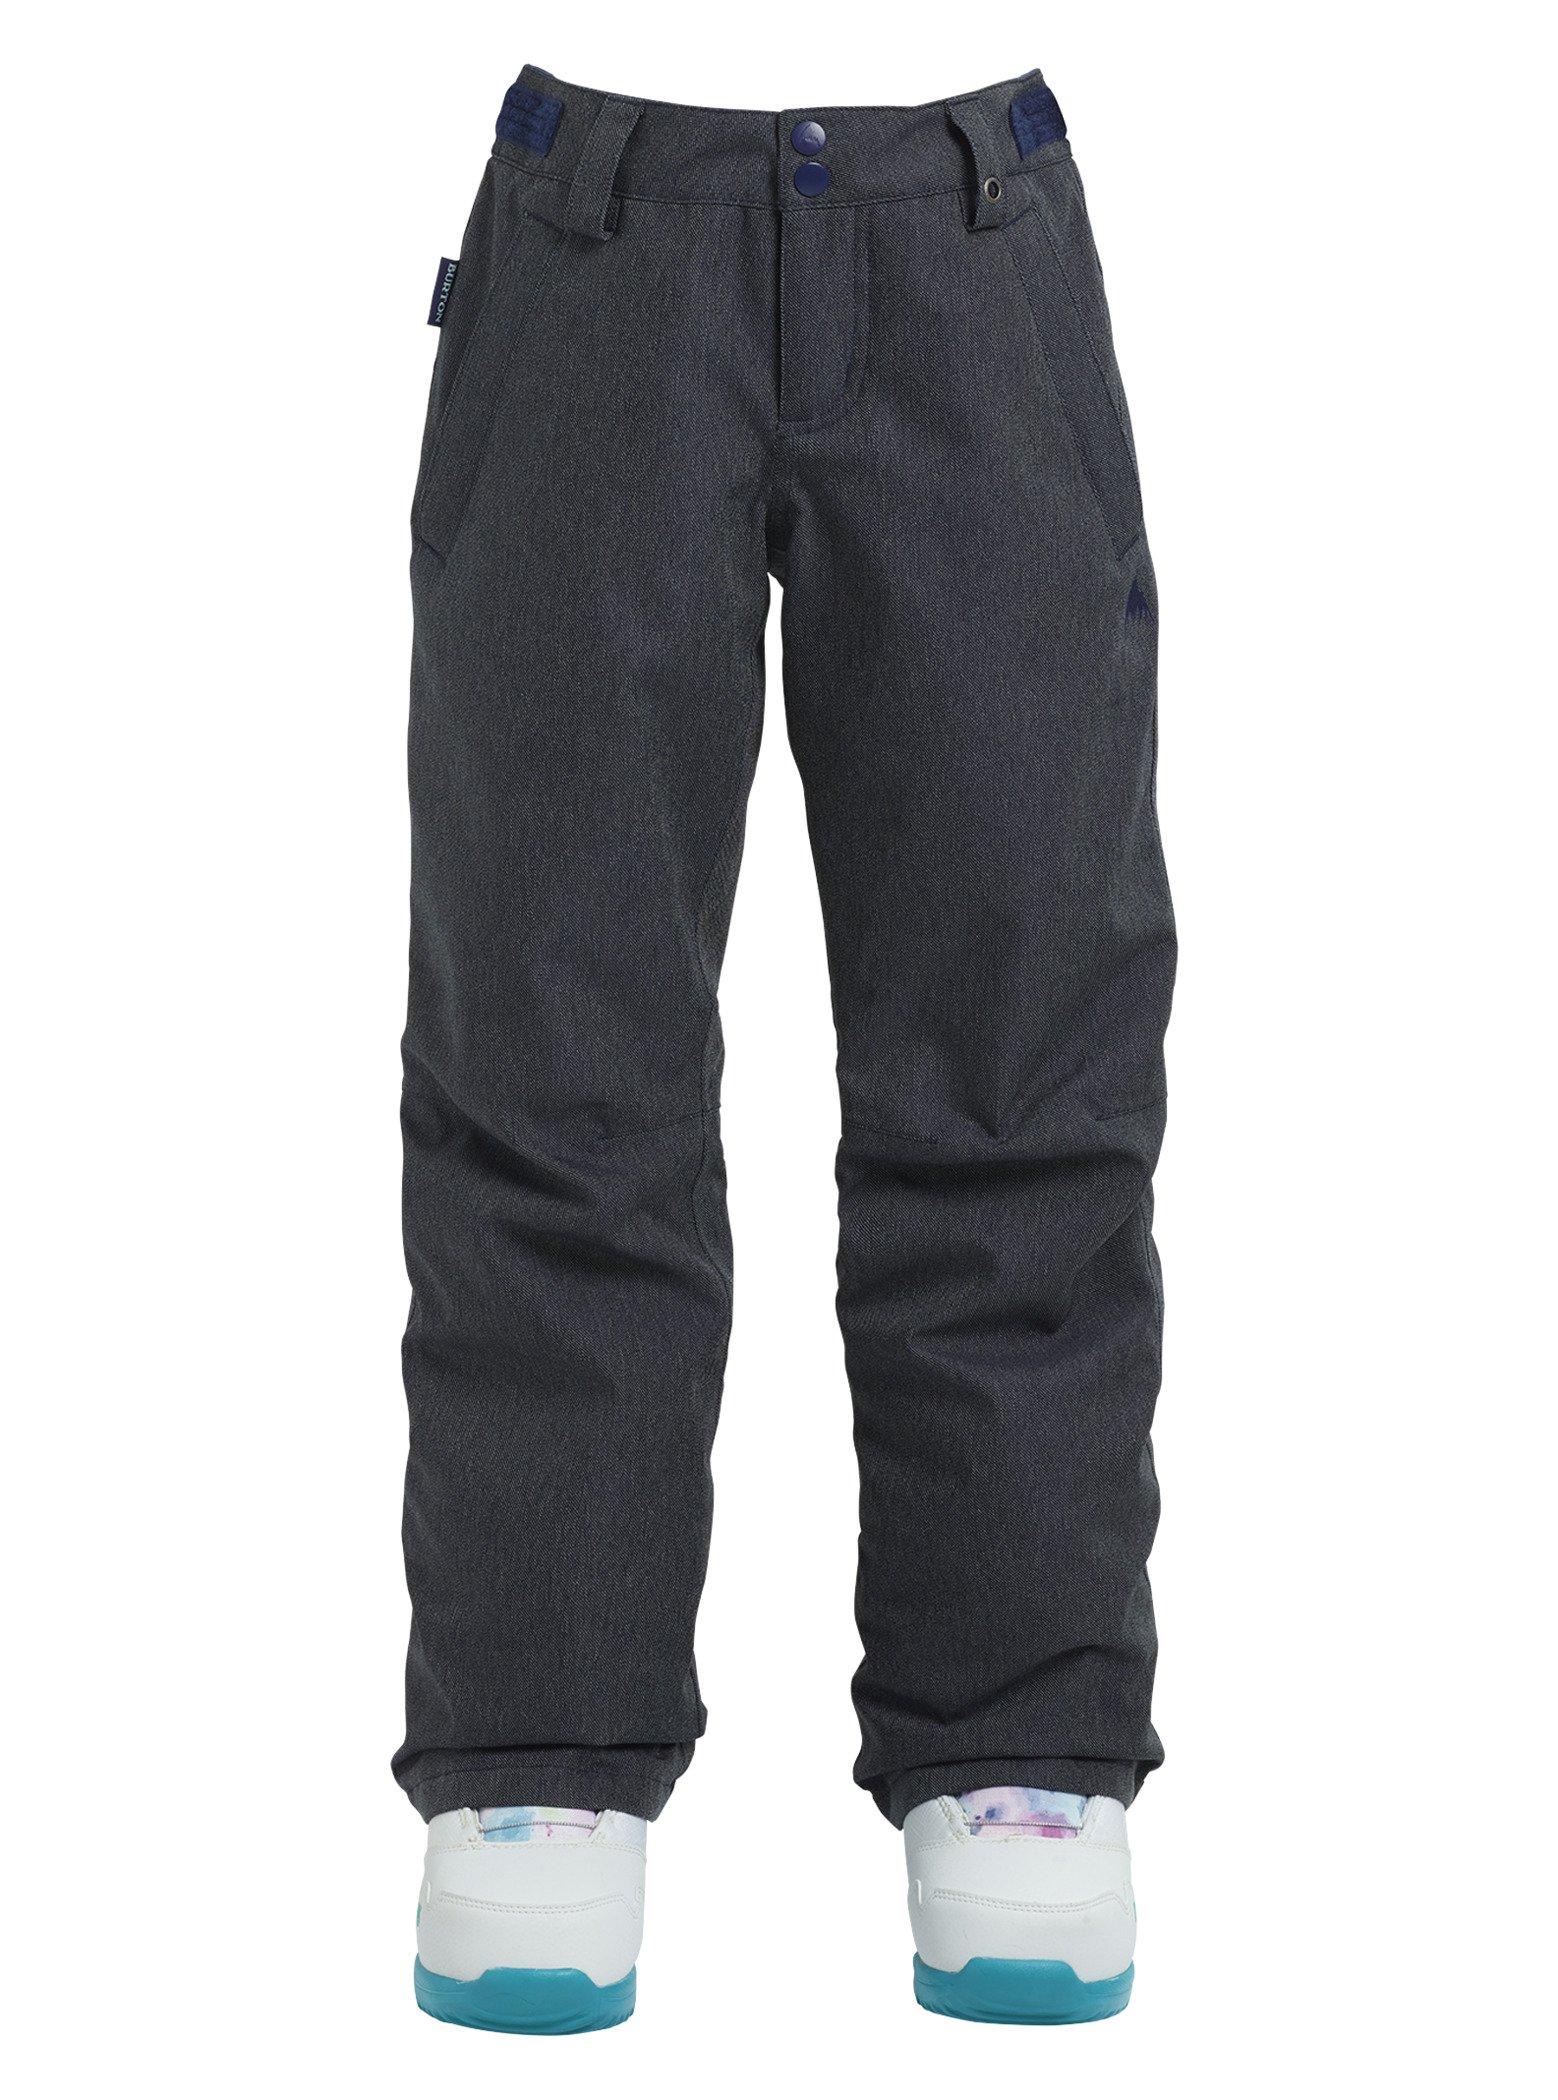 Burton Kids Girls Sweetart Snow Pants Denim Size Small